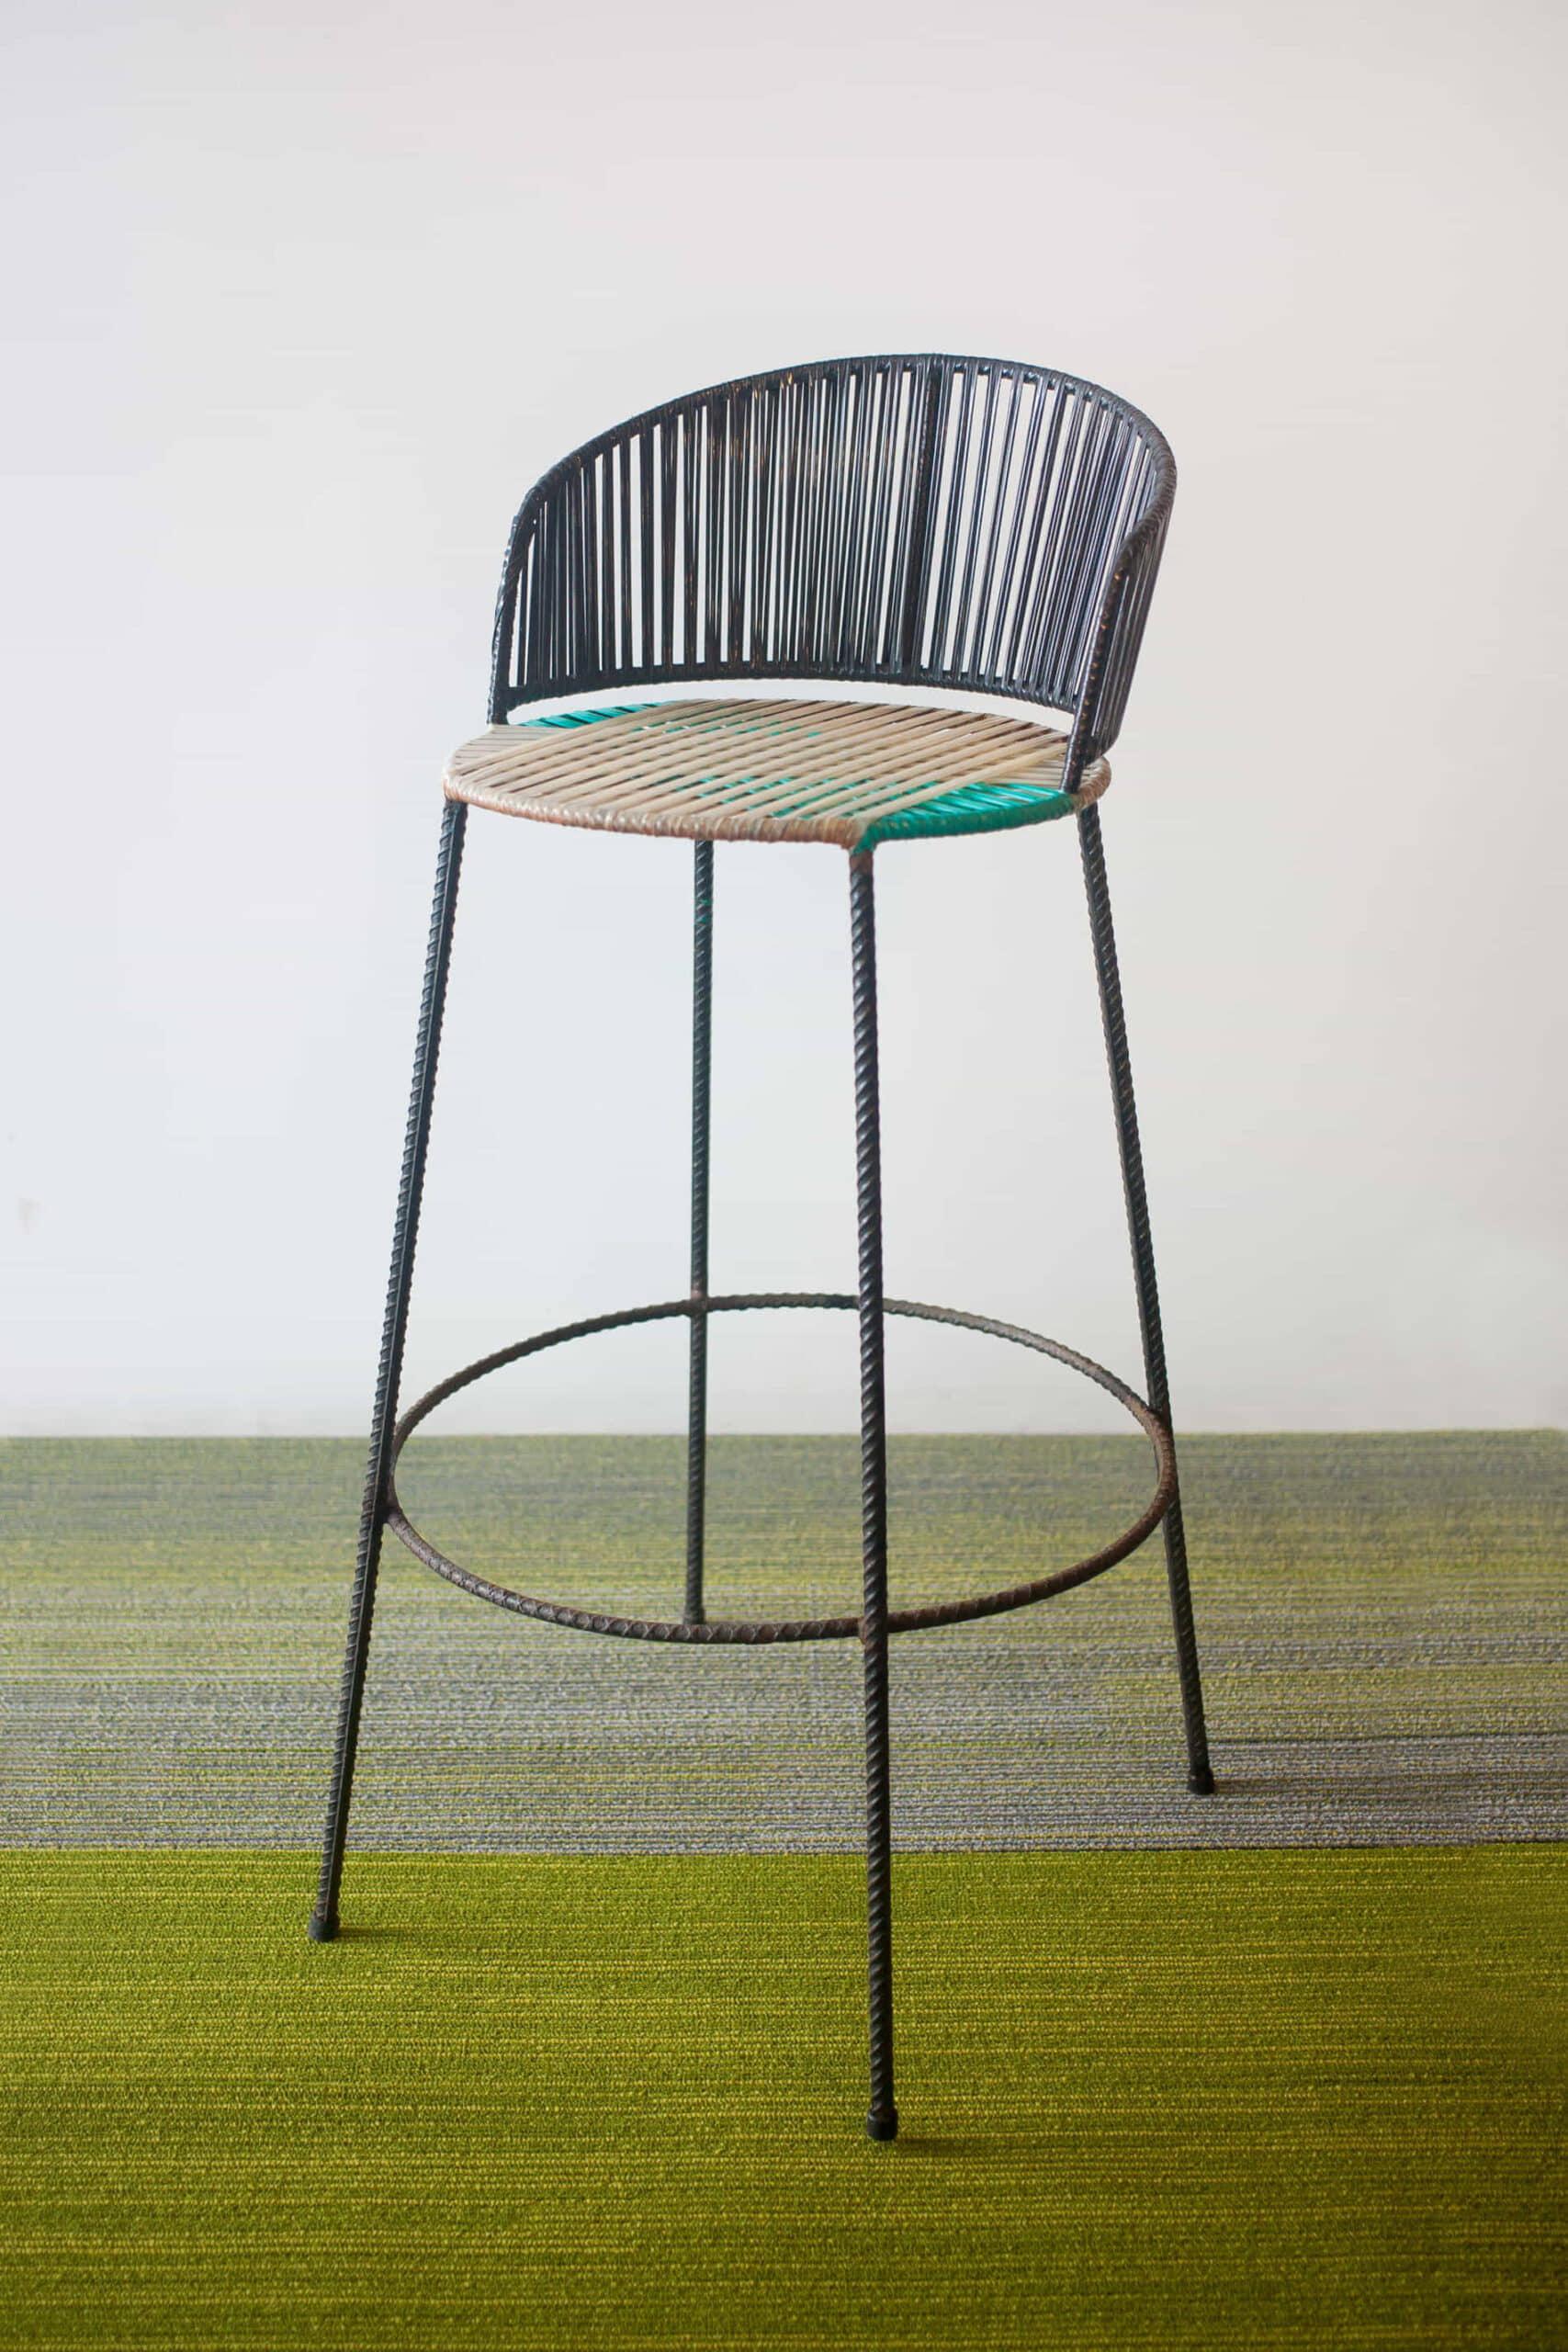 alt=silla restaurada de reciclaje constructivo 3